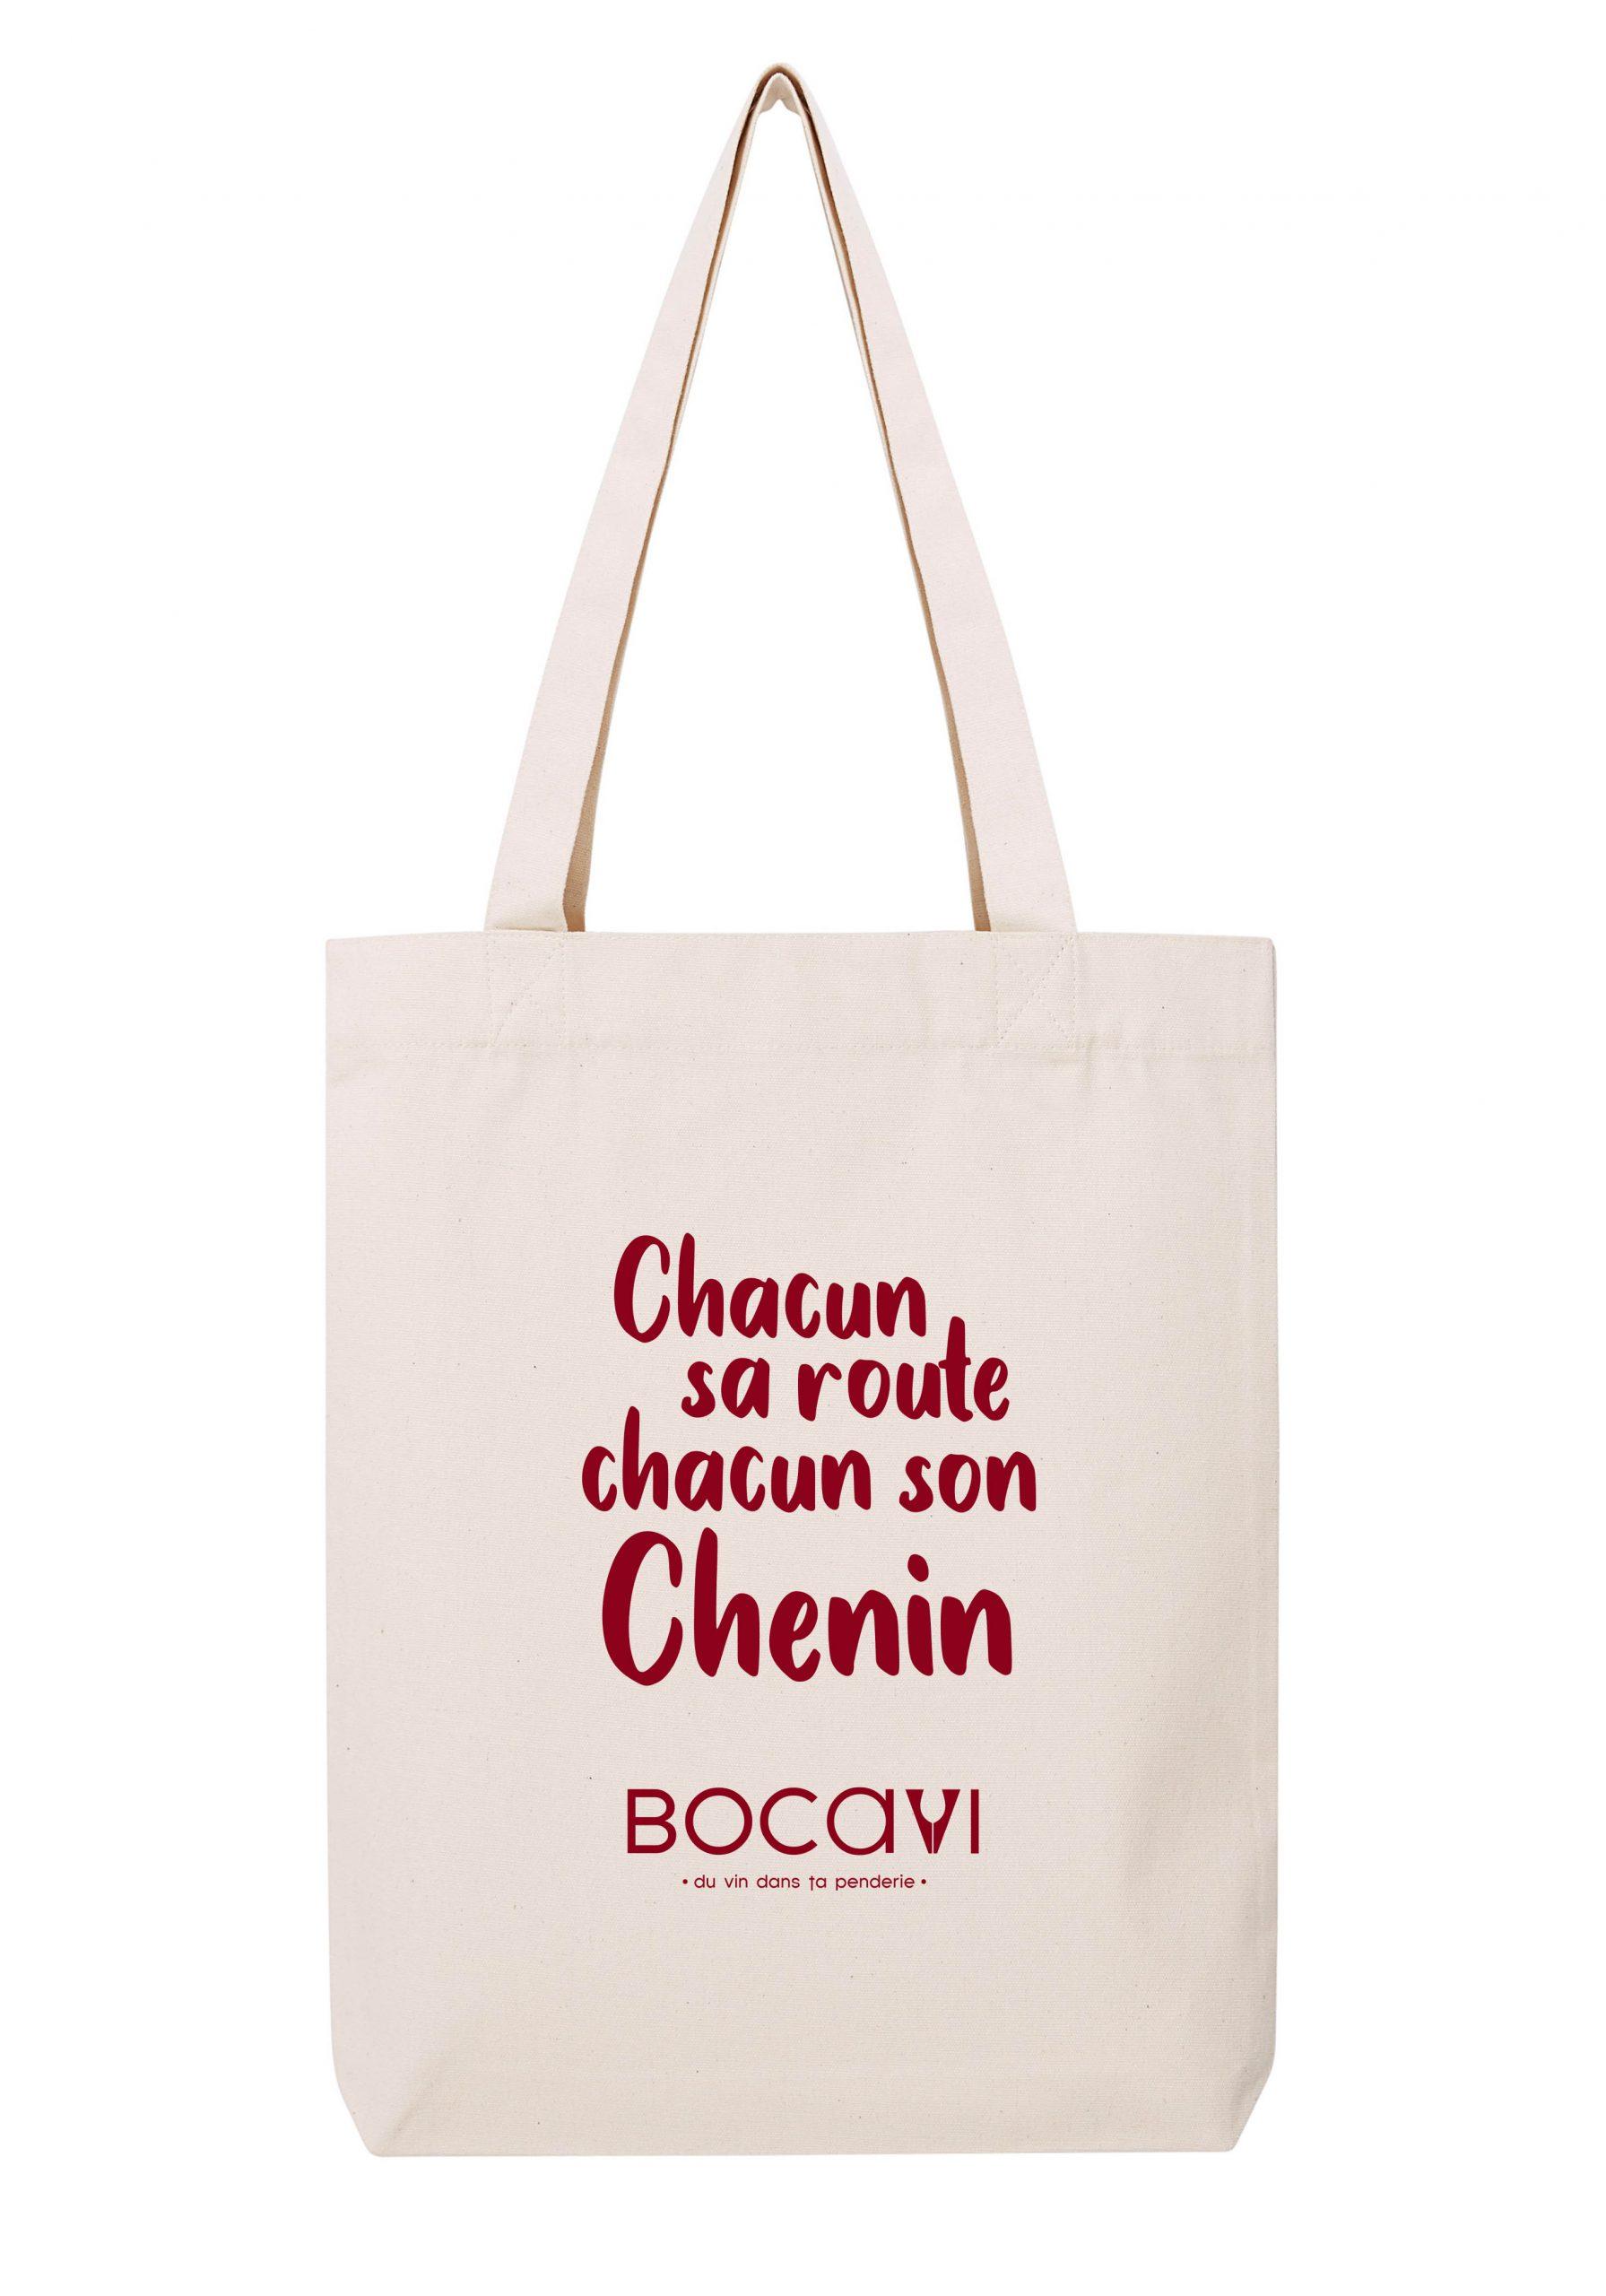 chacun sa route chacun son chenin sac coton tote bag bio bocavi du vin dans ta penderie bouteilles viticole vigneron wine